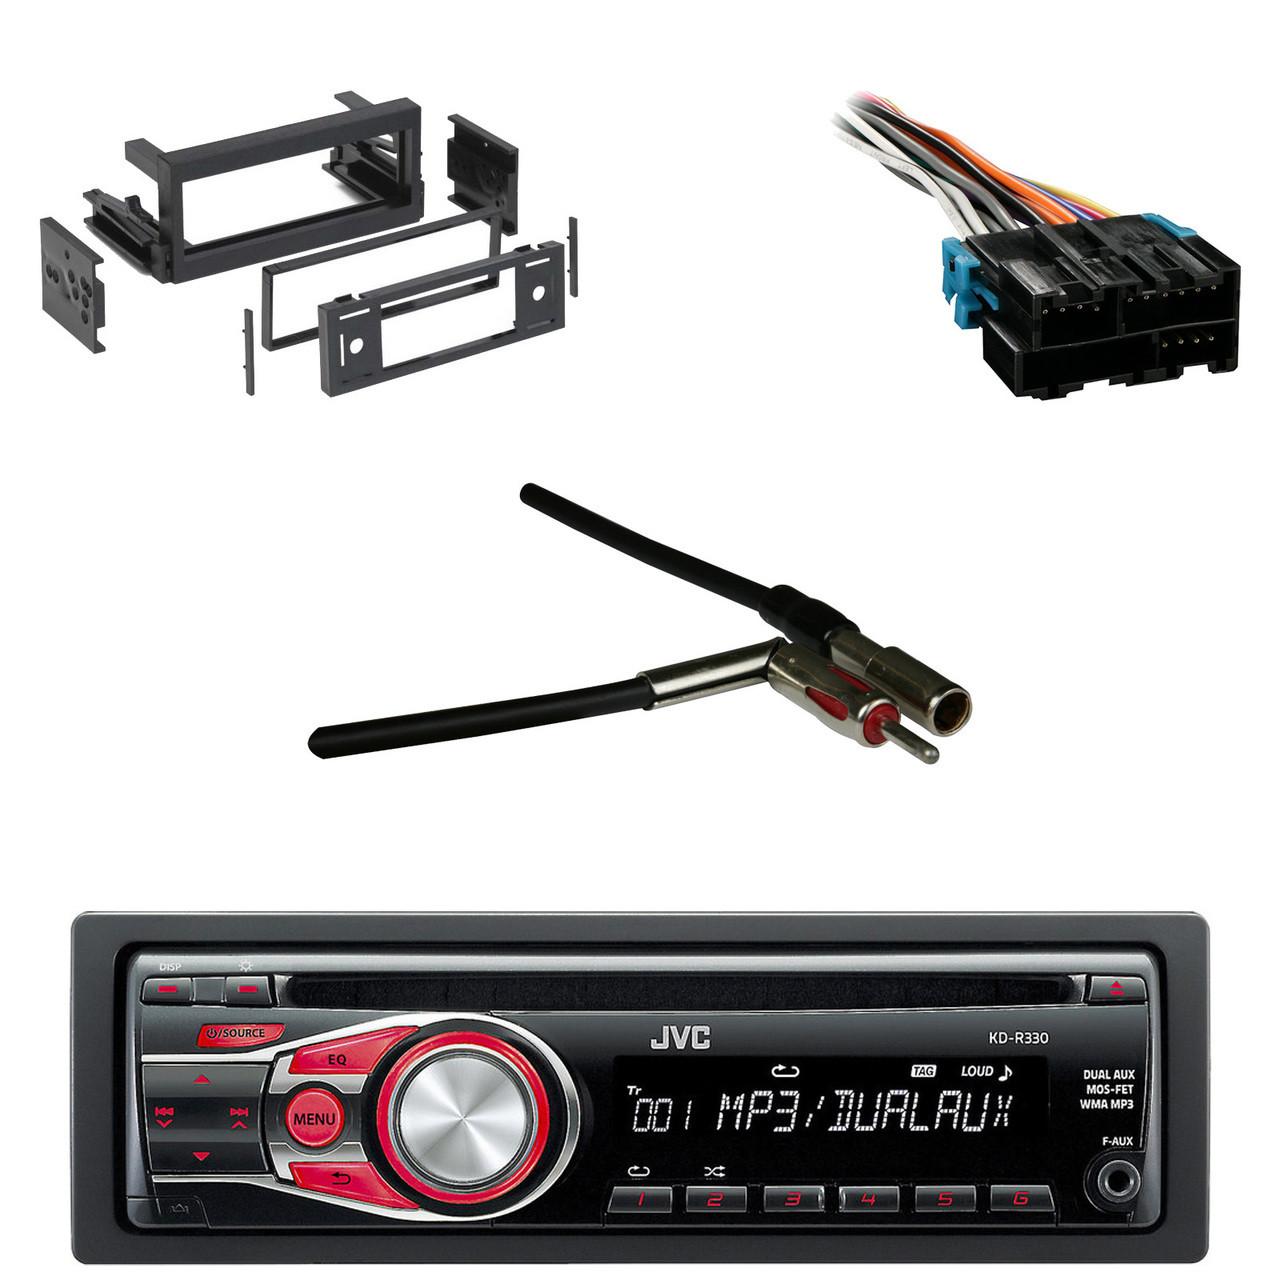 hight resolution of jvc kdr330 cd aux car radio antenn adapter gm wire harness gm rh roadentertainment com wiring